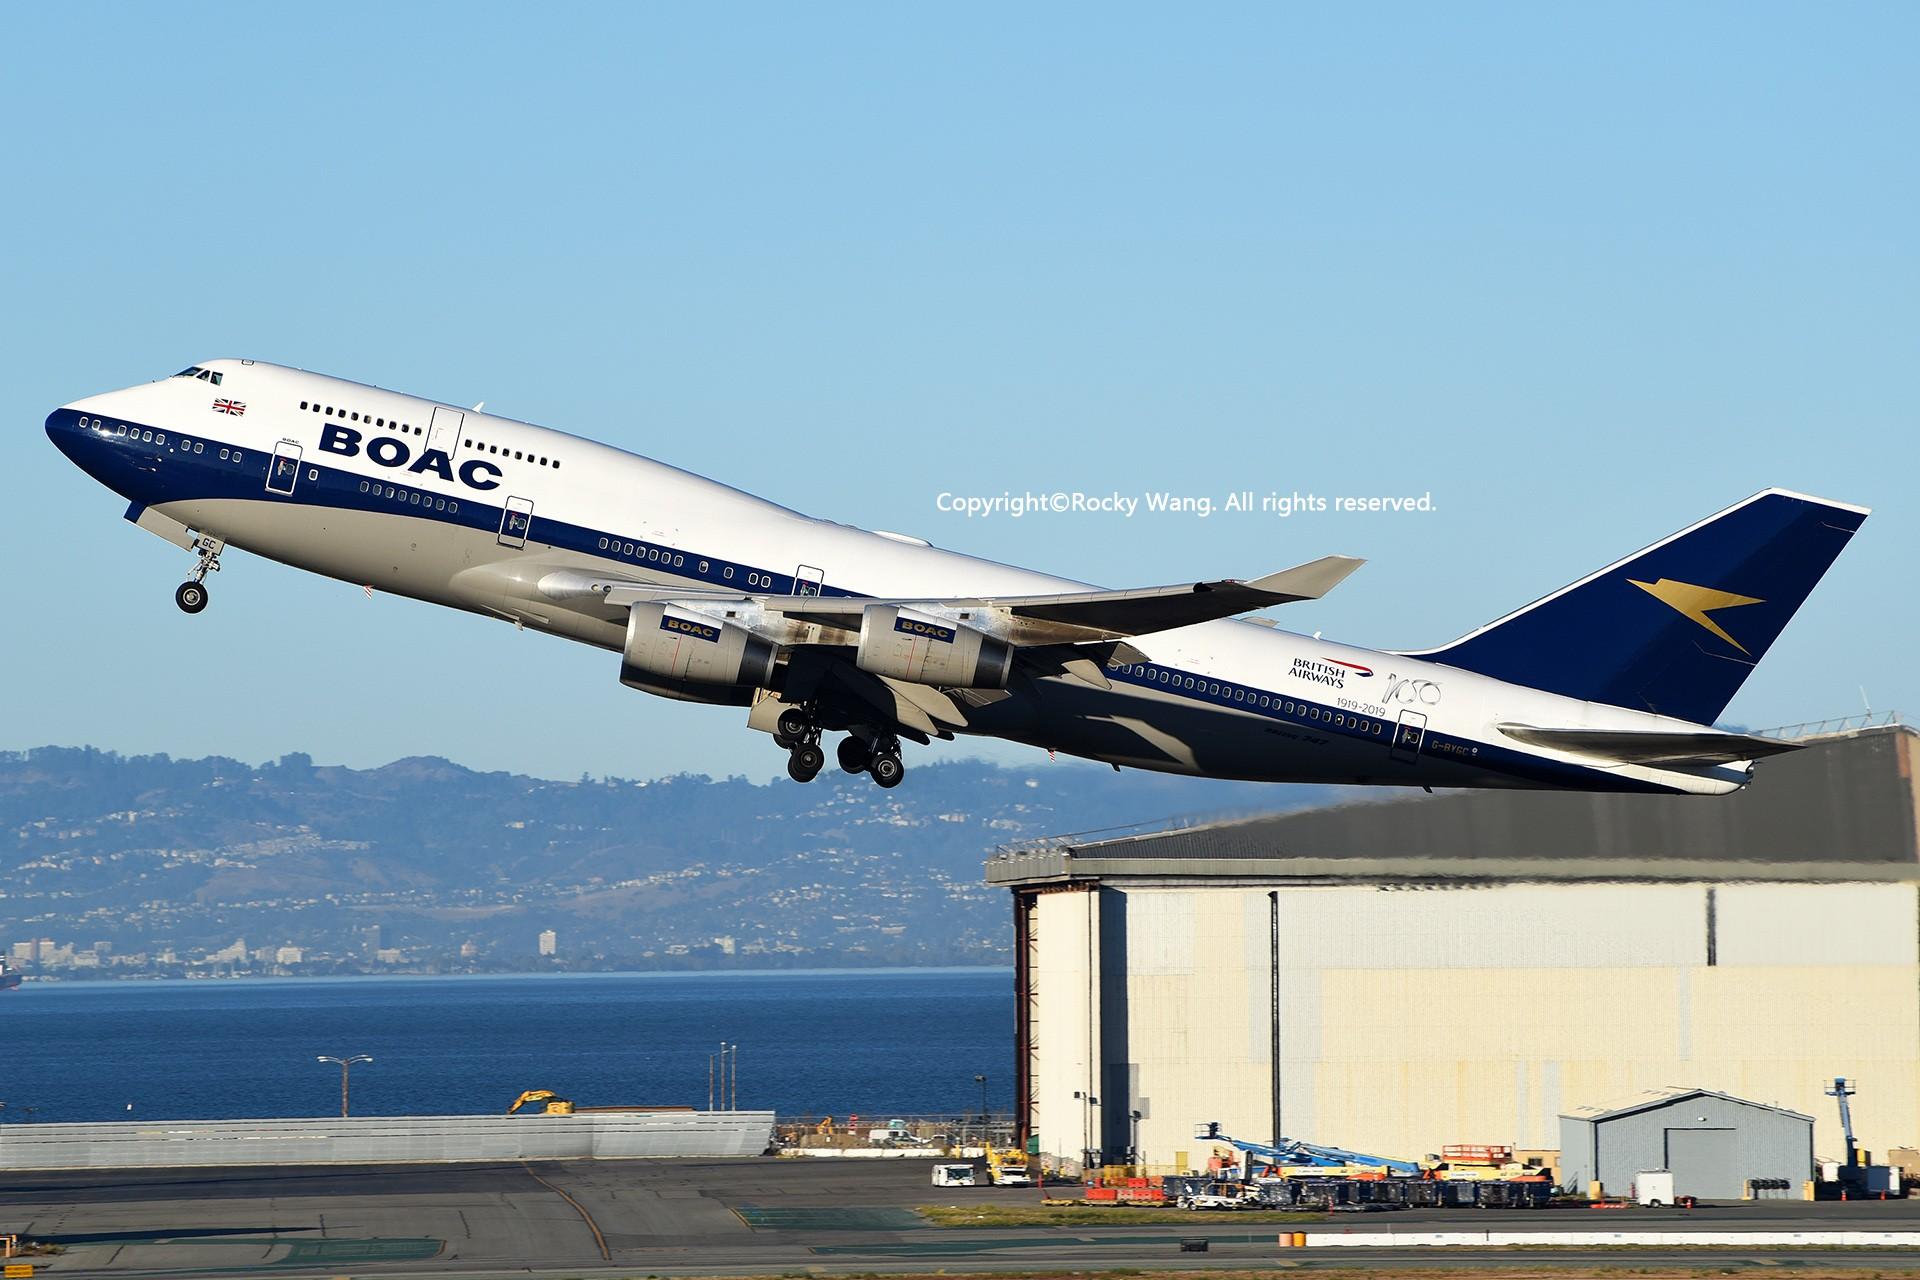 Re:[原创]彩绘圣地-附加彩蛋 BOEING 747-436 G-BYGC San Francisco Int'l Airport